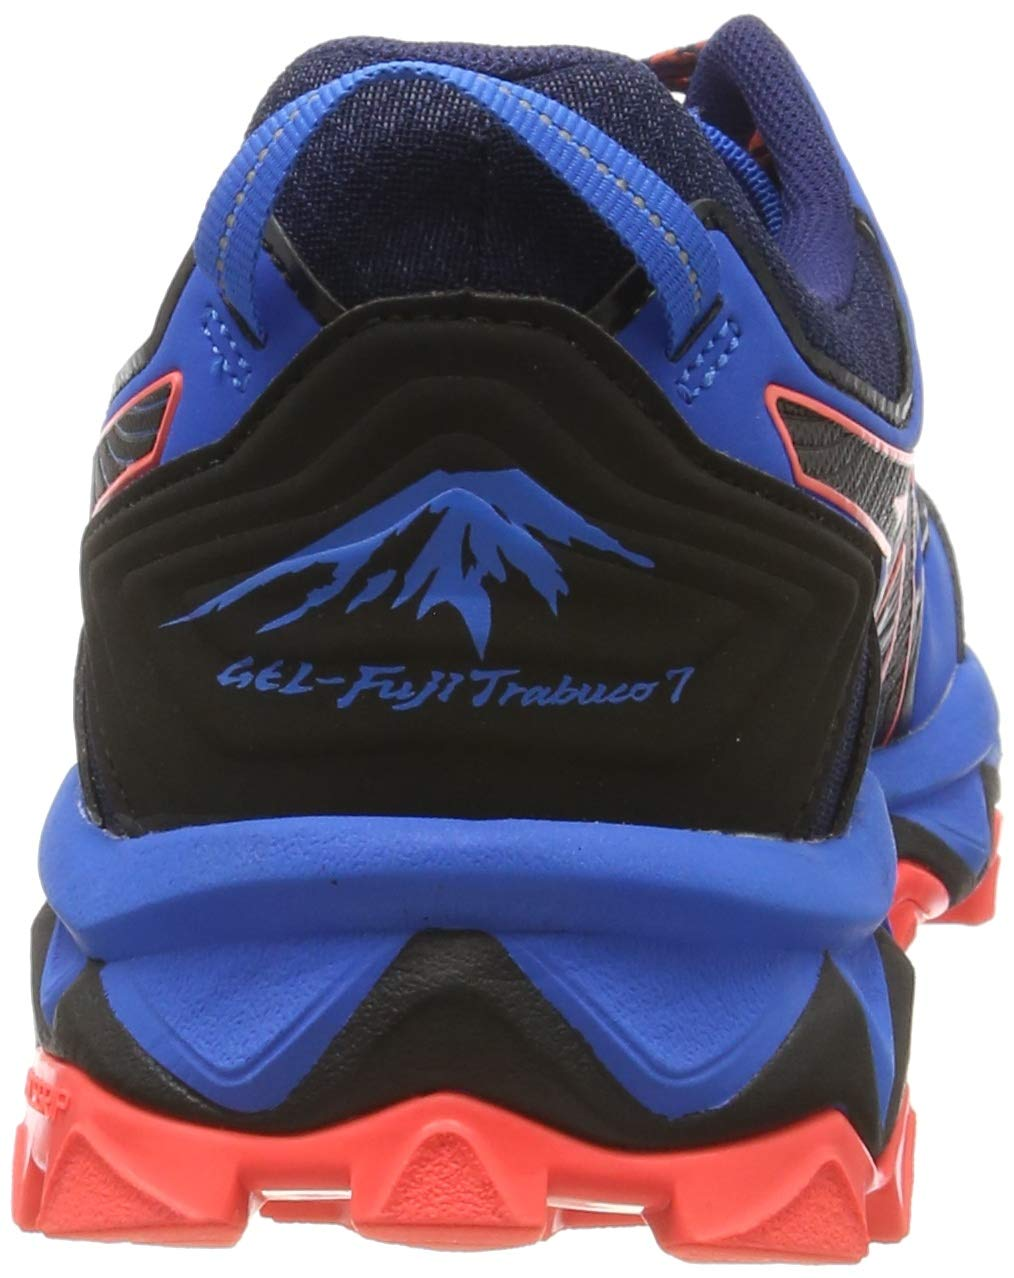 Asics Herren Frequent Trail Turnschuhe Laufschuhe Sneaker Marineblau Low Sport